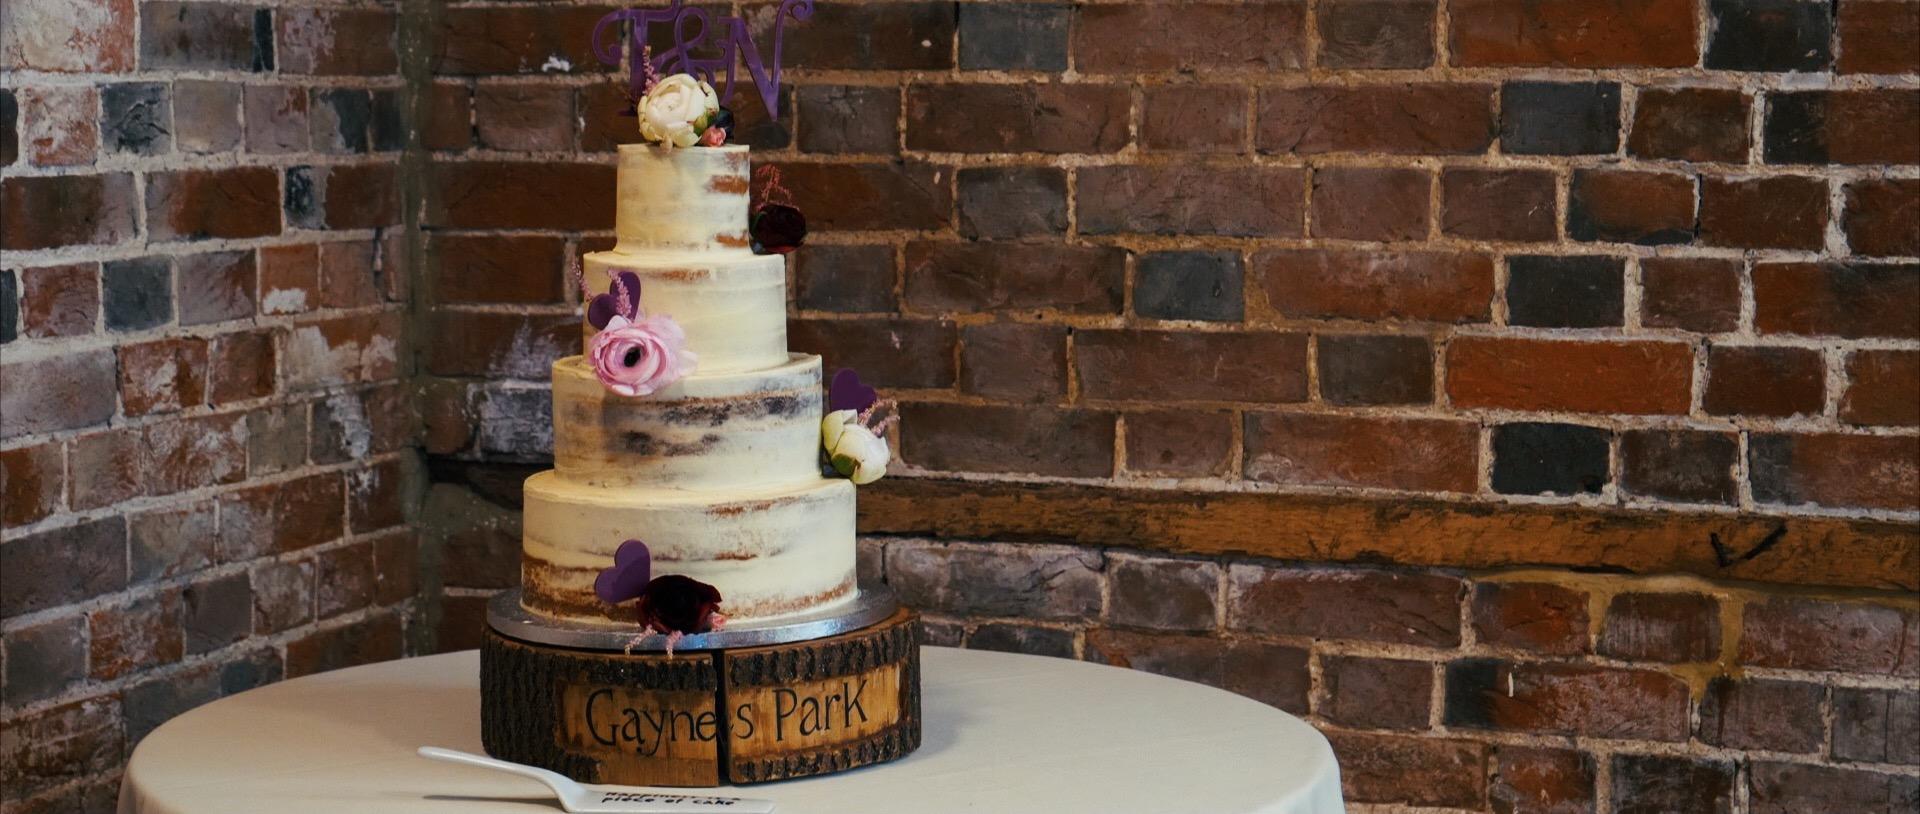 Gaynes Park natural wedding cake video.jpg